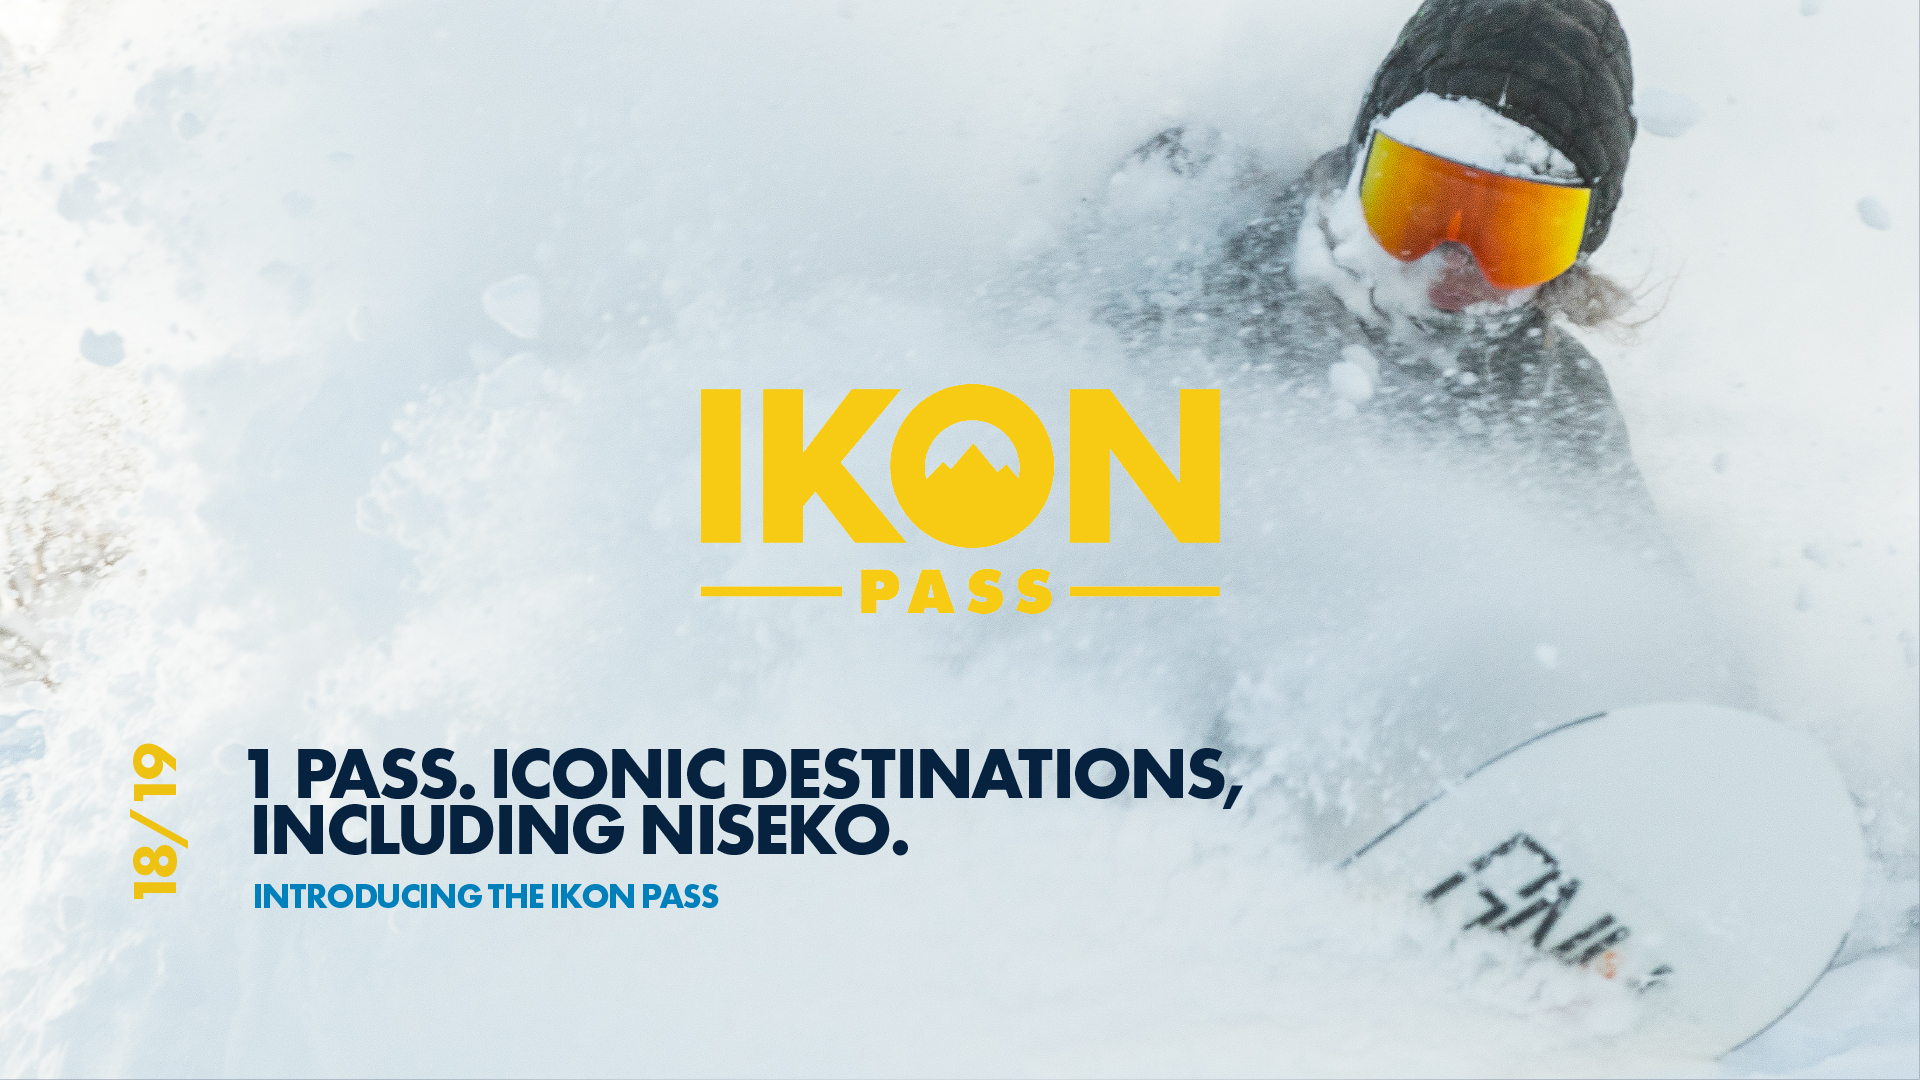 Niseko unites with another global ski pass – Ikon Pass